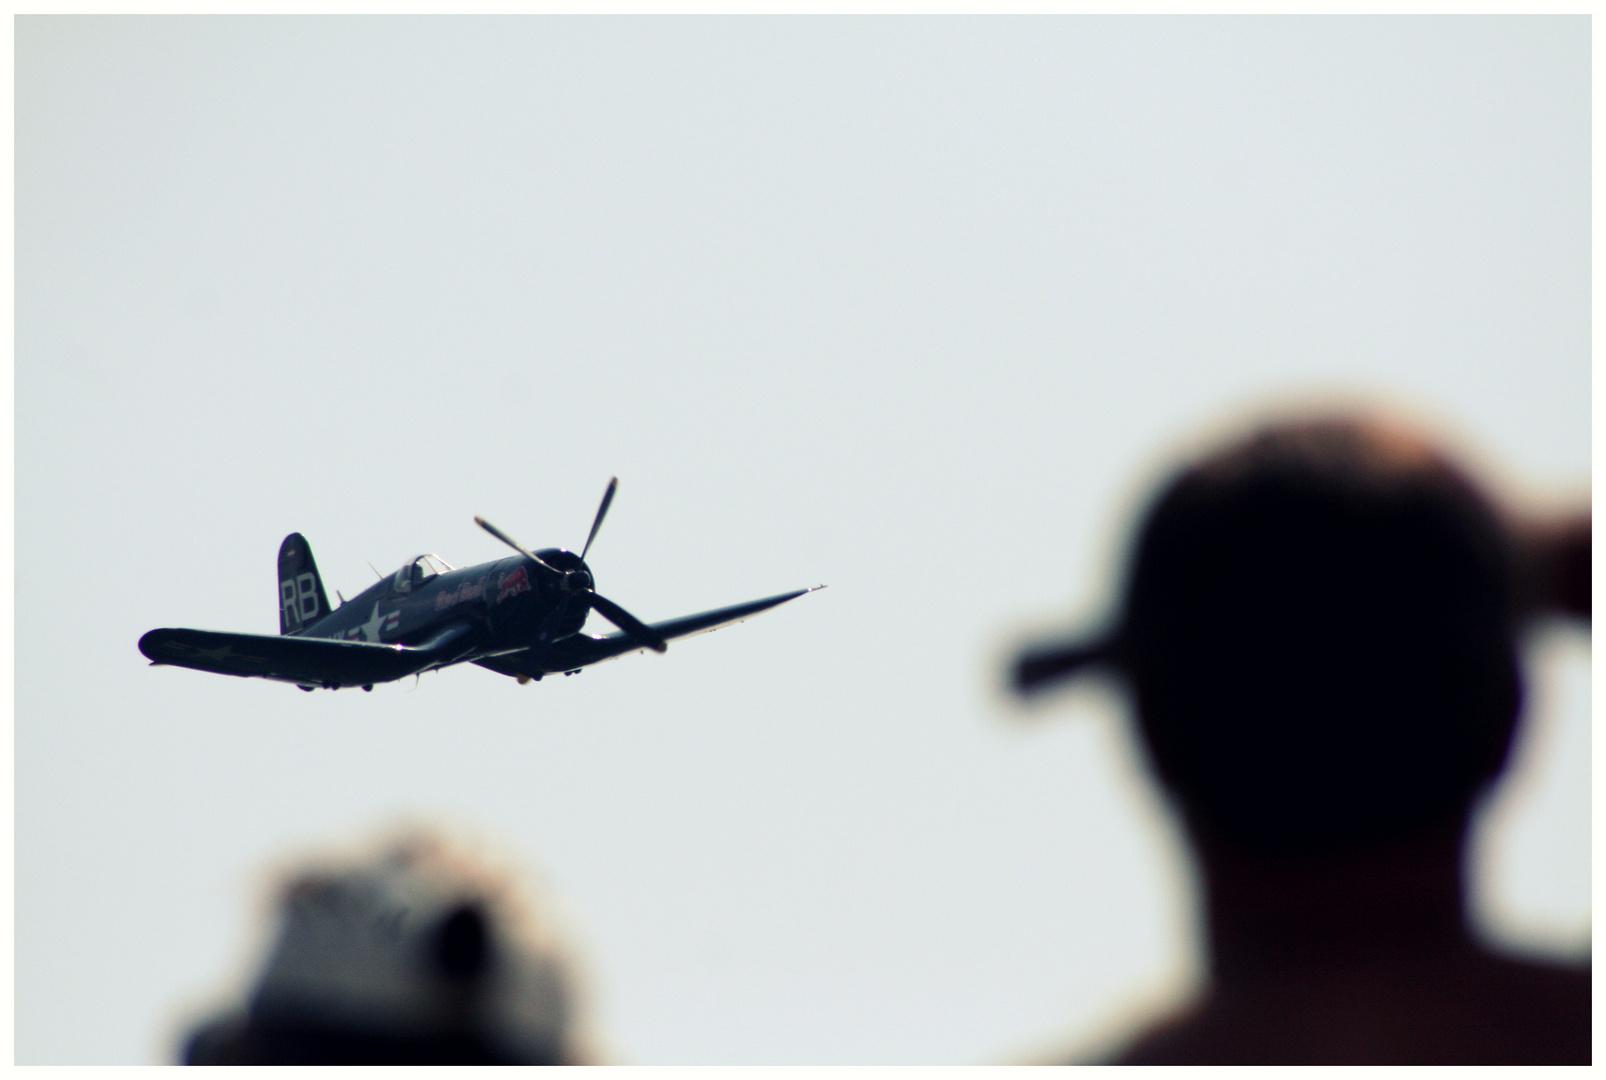 ...Red Bull Air Race...